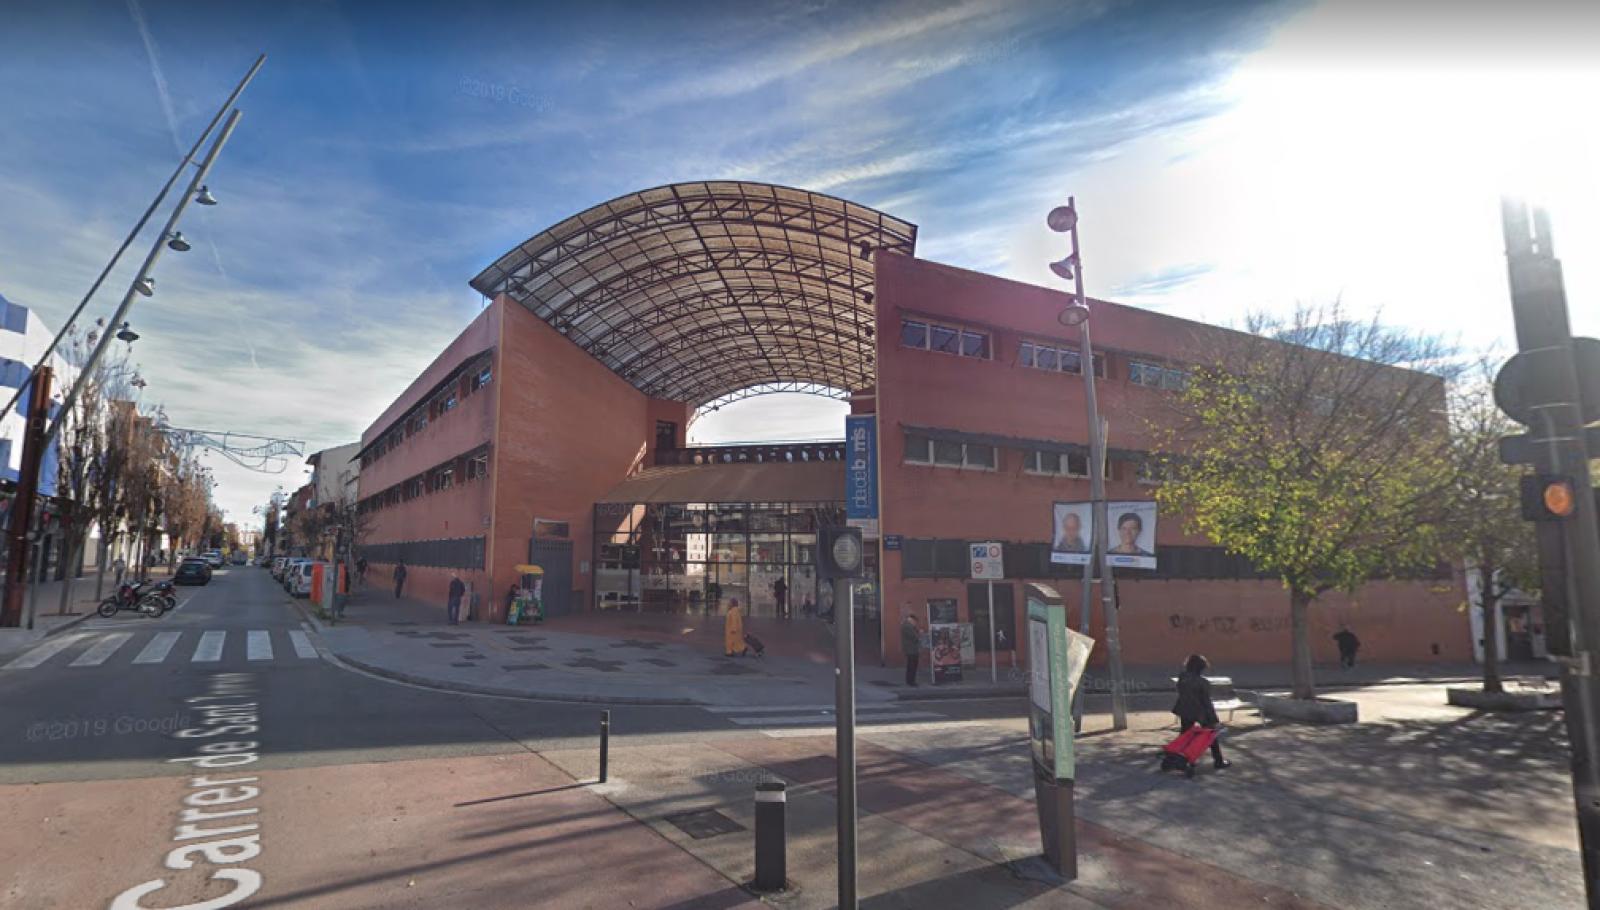 El Centre Cívic Montserrat Roig